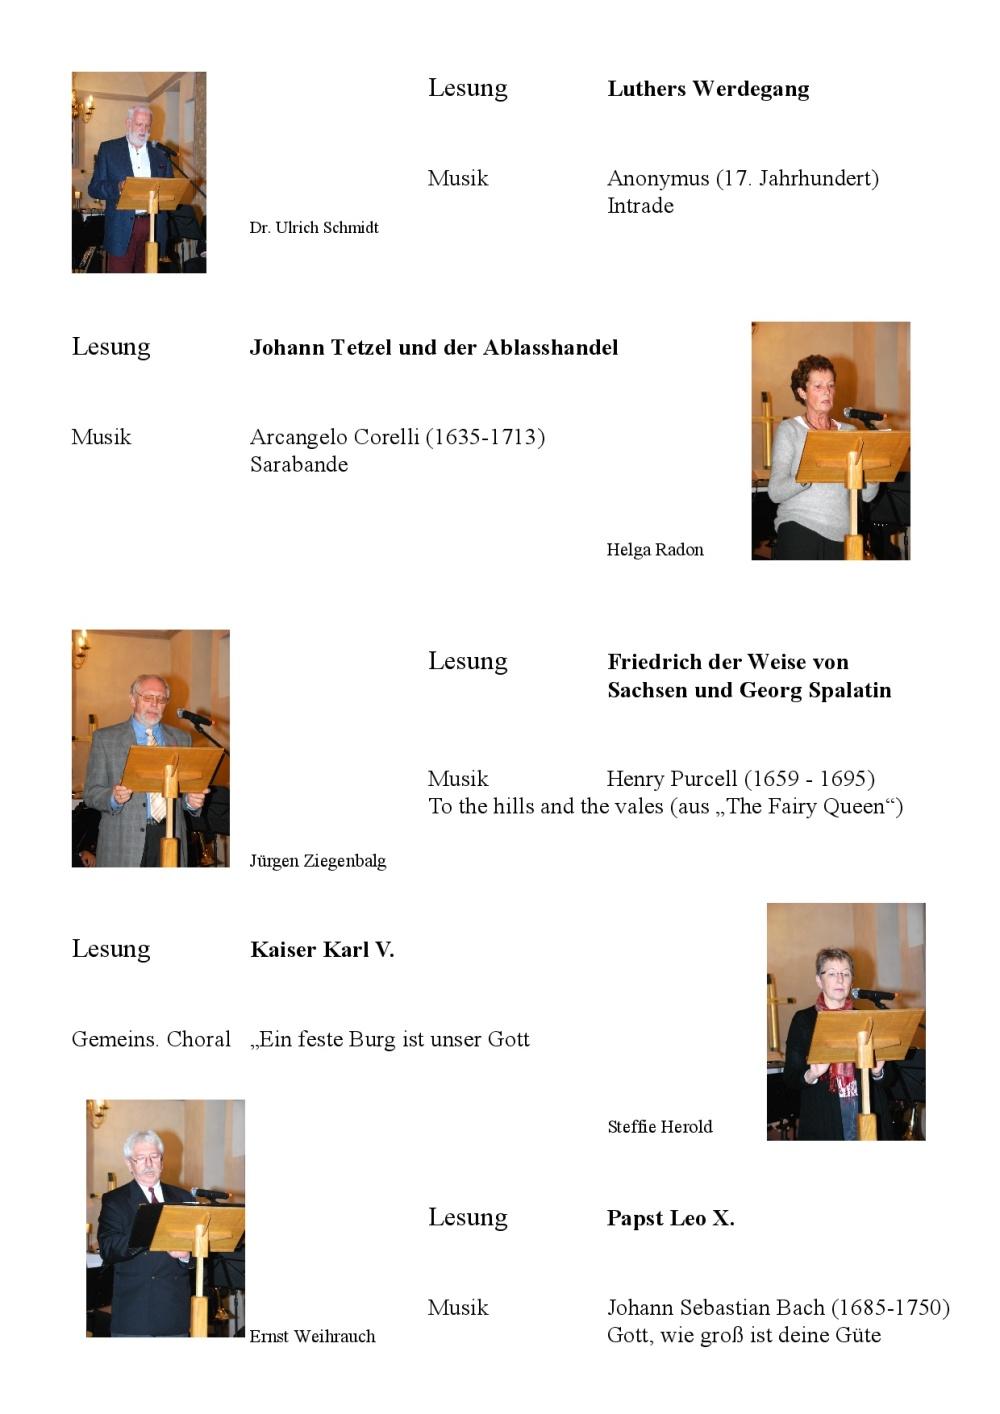 32-Reformationsfest 31.10.14-002